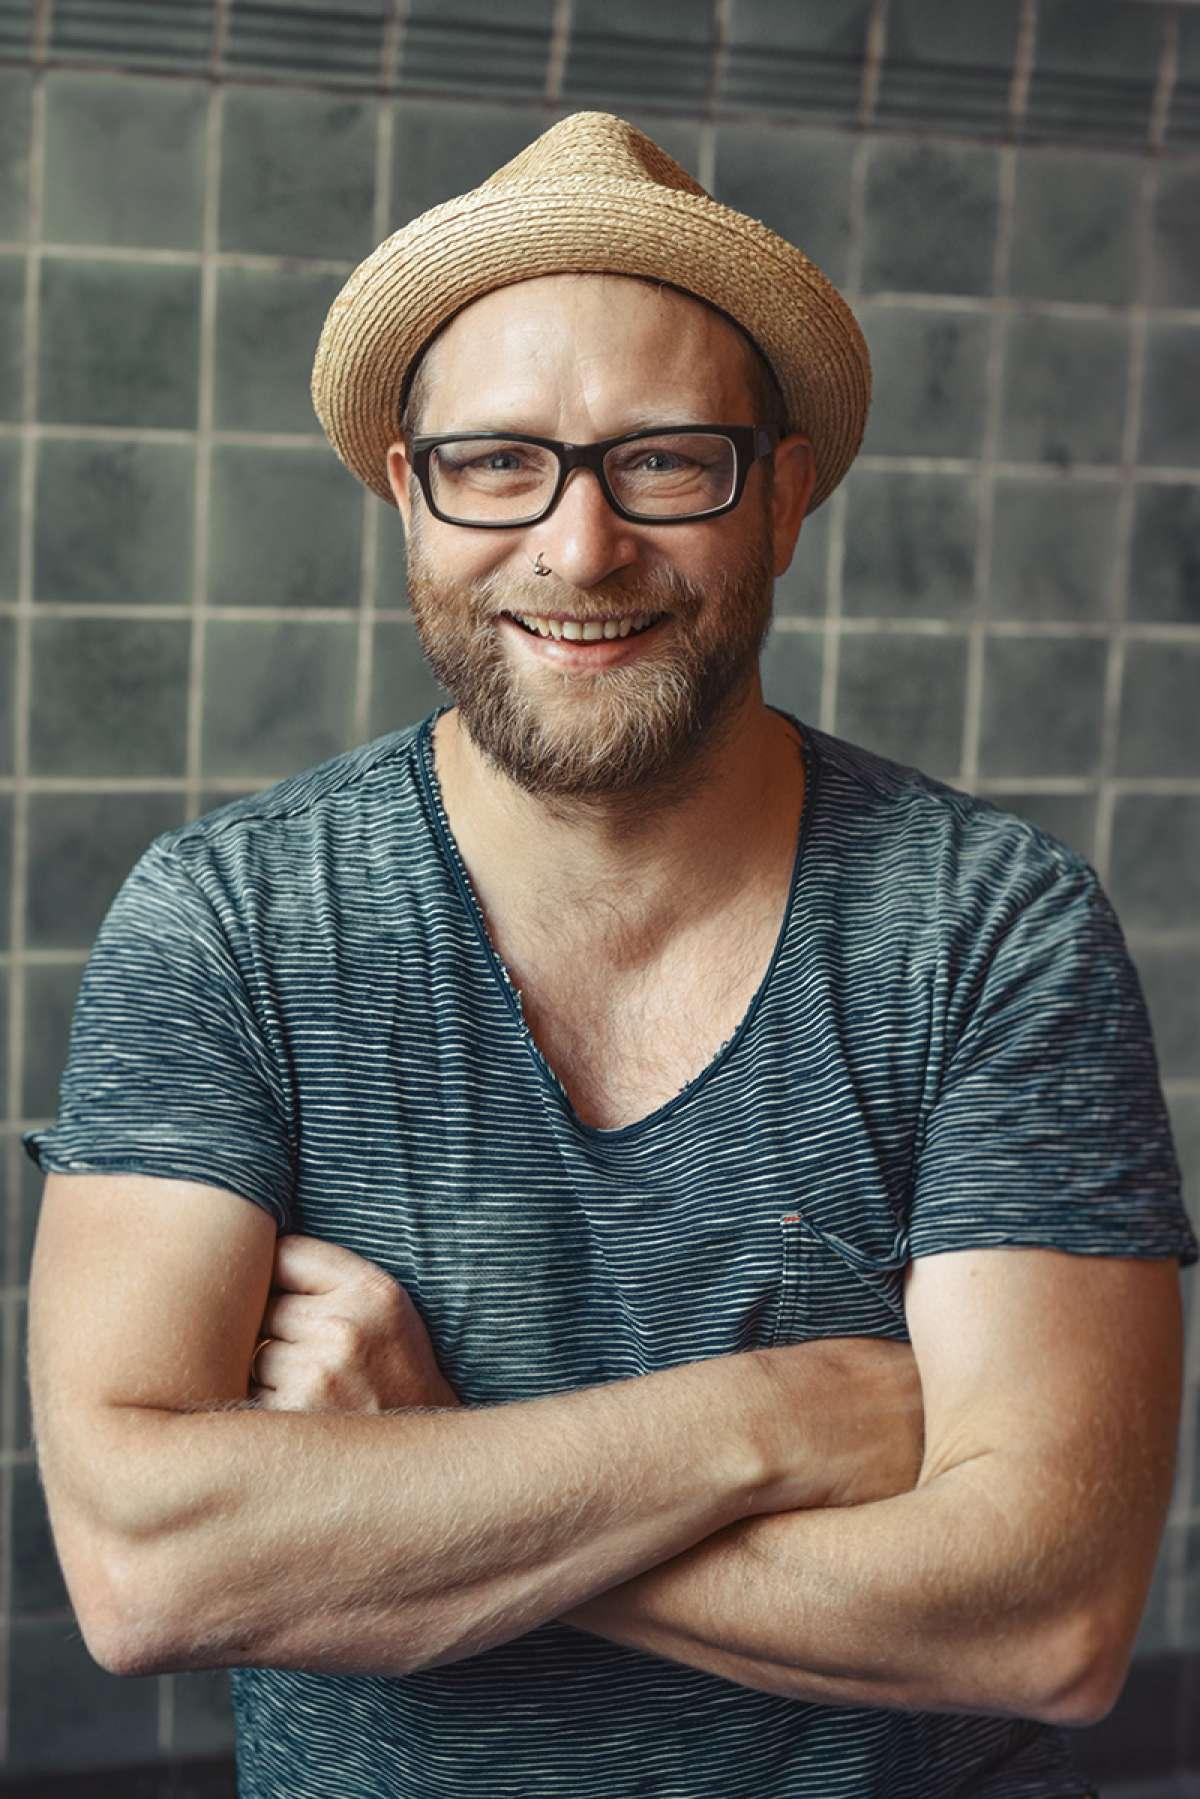 Sommerkonzert 2021 - Gregor Meyle & Band - Kulturzelt  - Wolfhagen